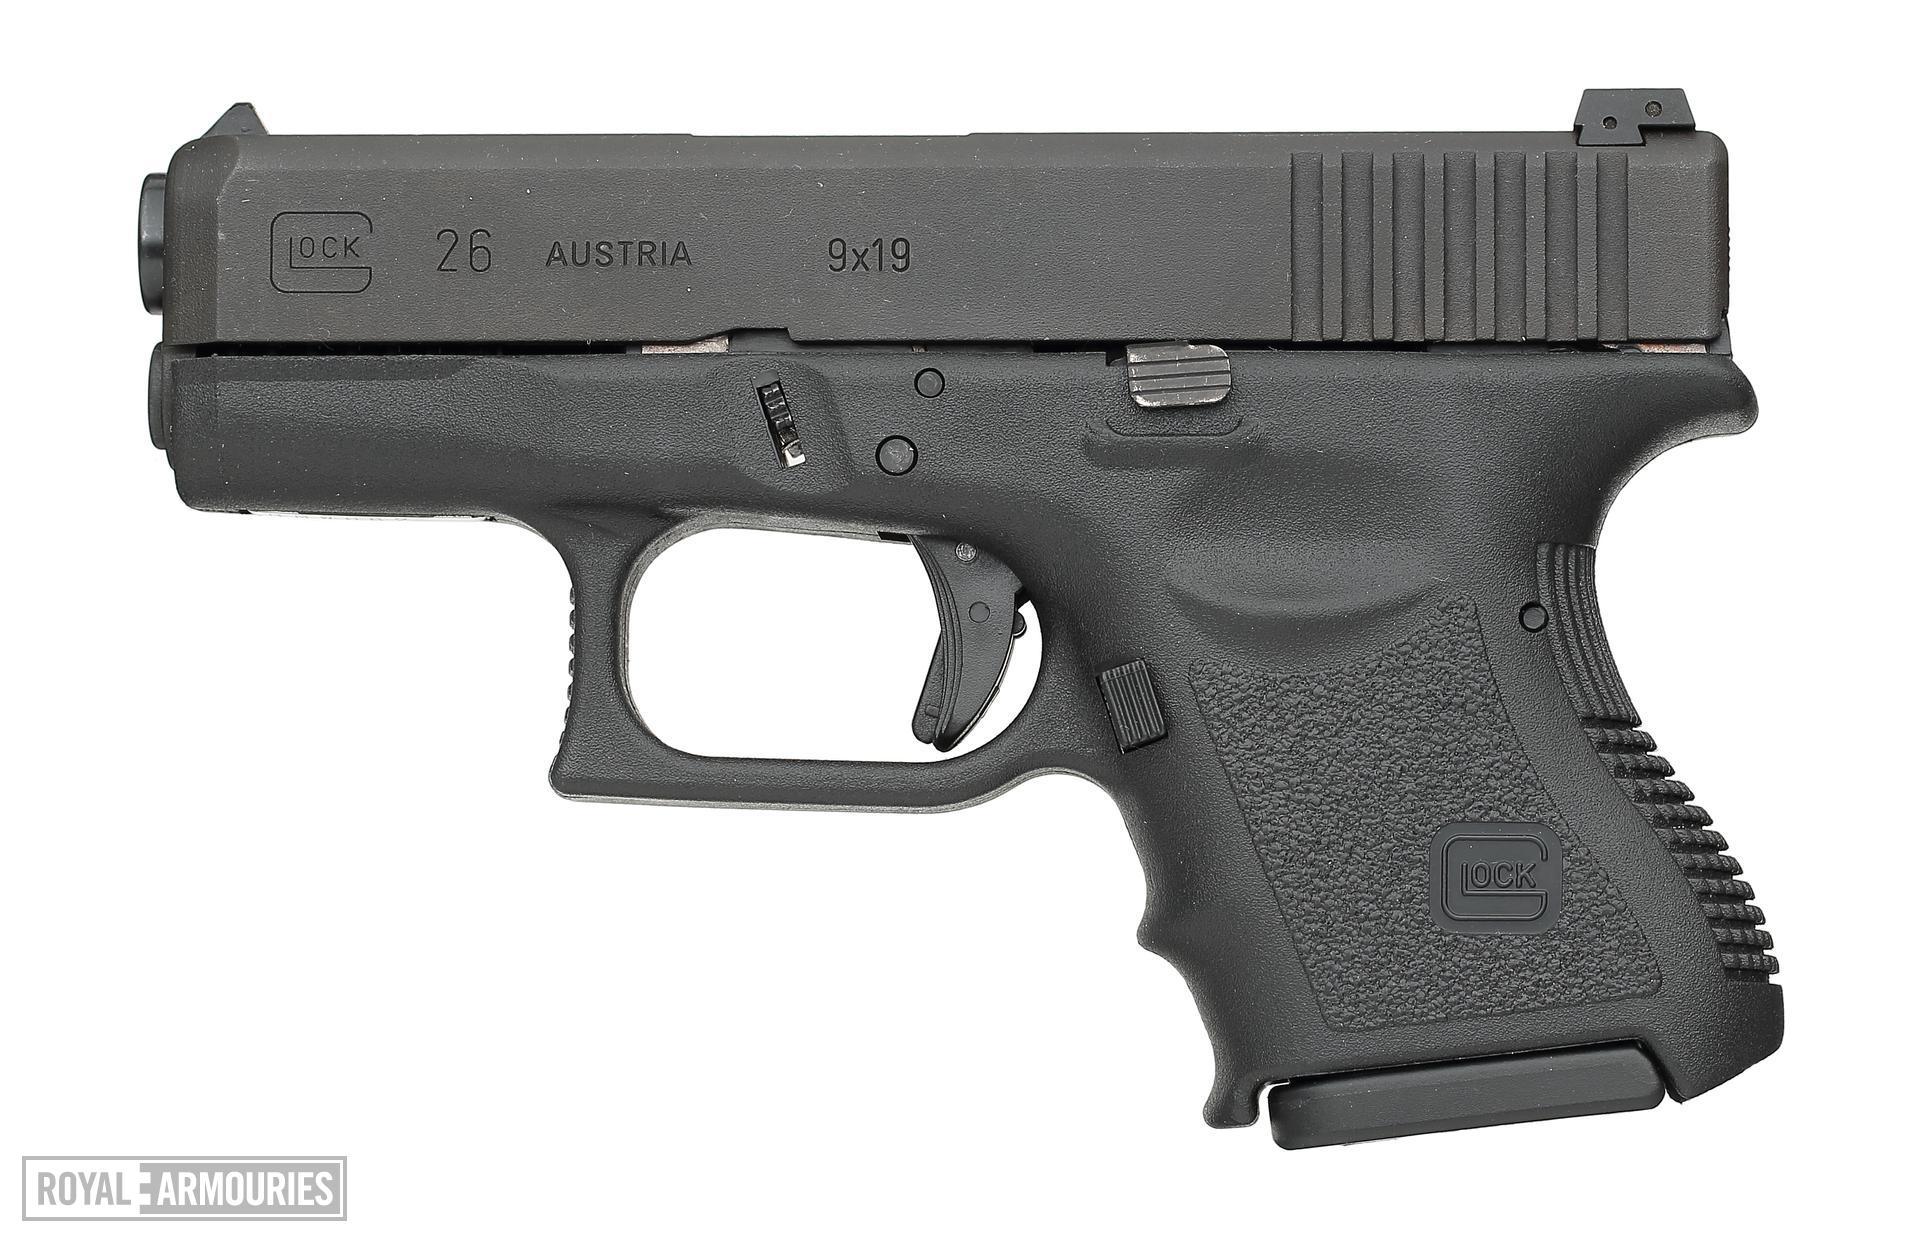 Centrefire self-loading pistol - Glock 26 Generation 3 Standard Generation 3 pattern sub-compact pistol.